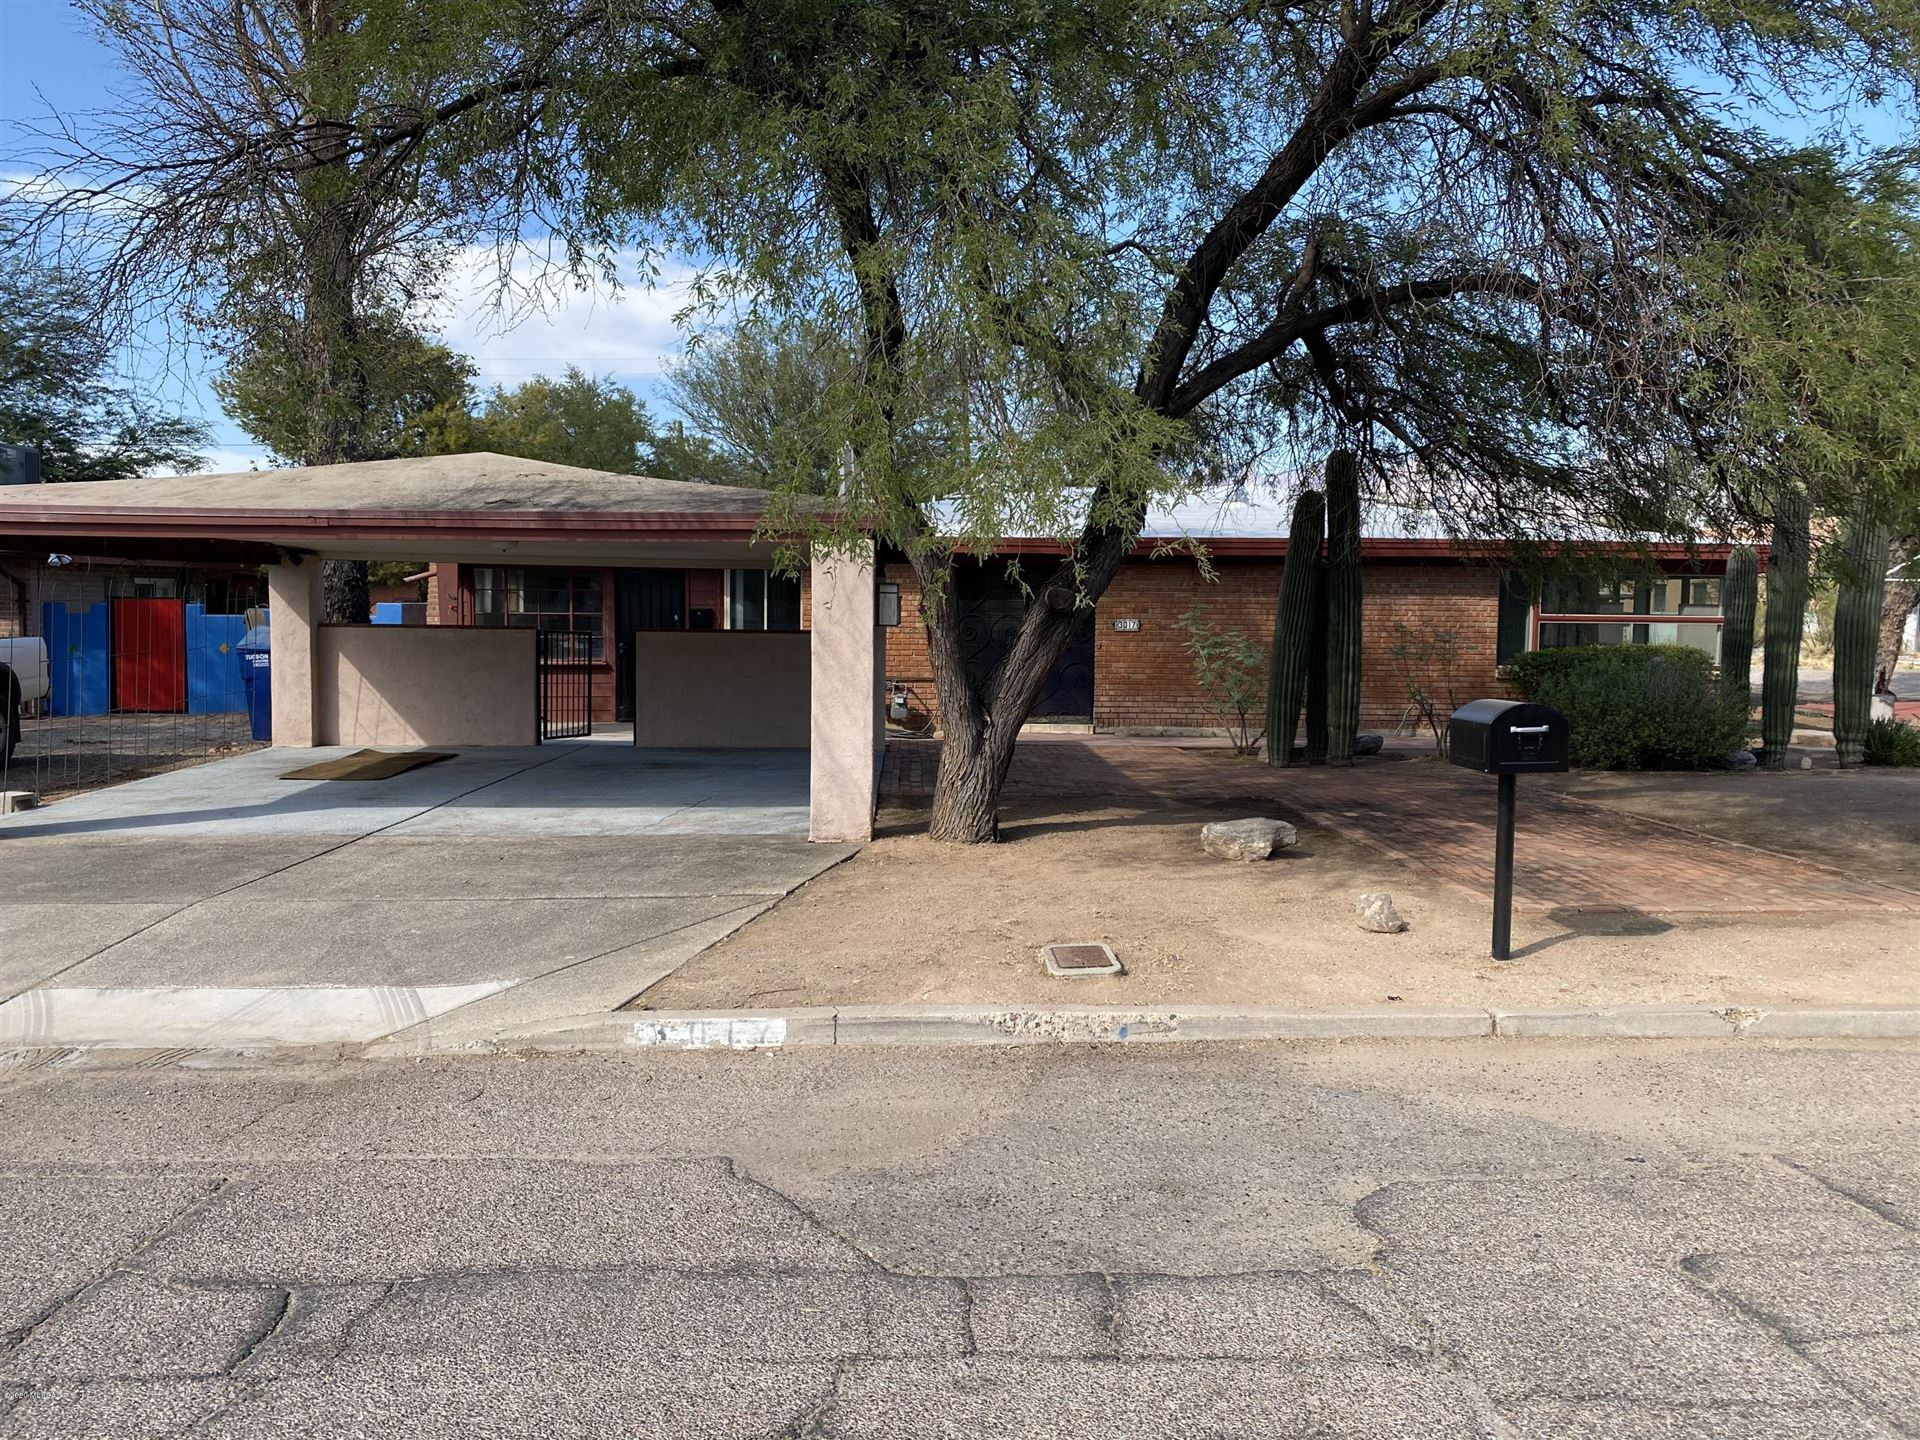 3017 E Loretta Drive, Tucson, AZ 85716 - MLS#: 22025517